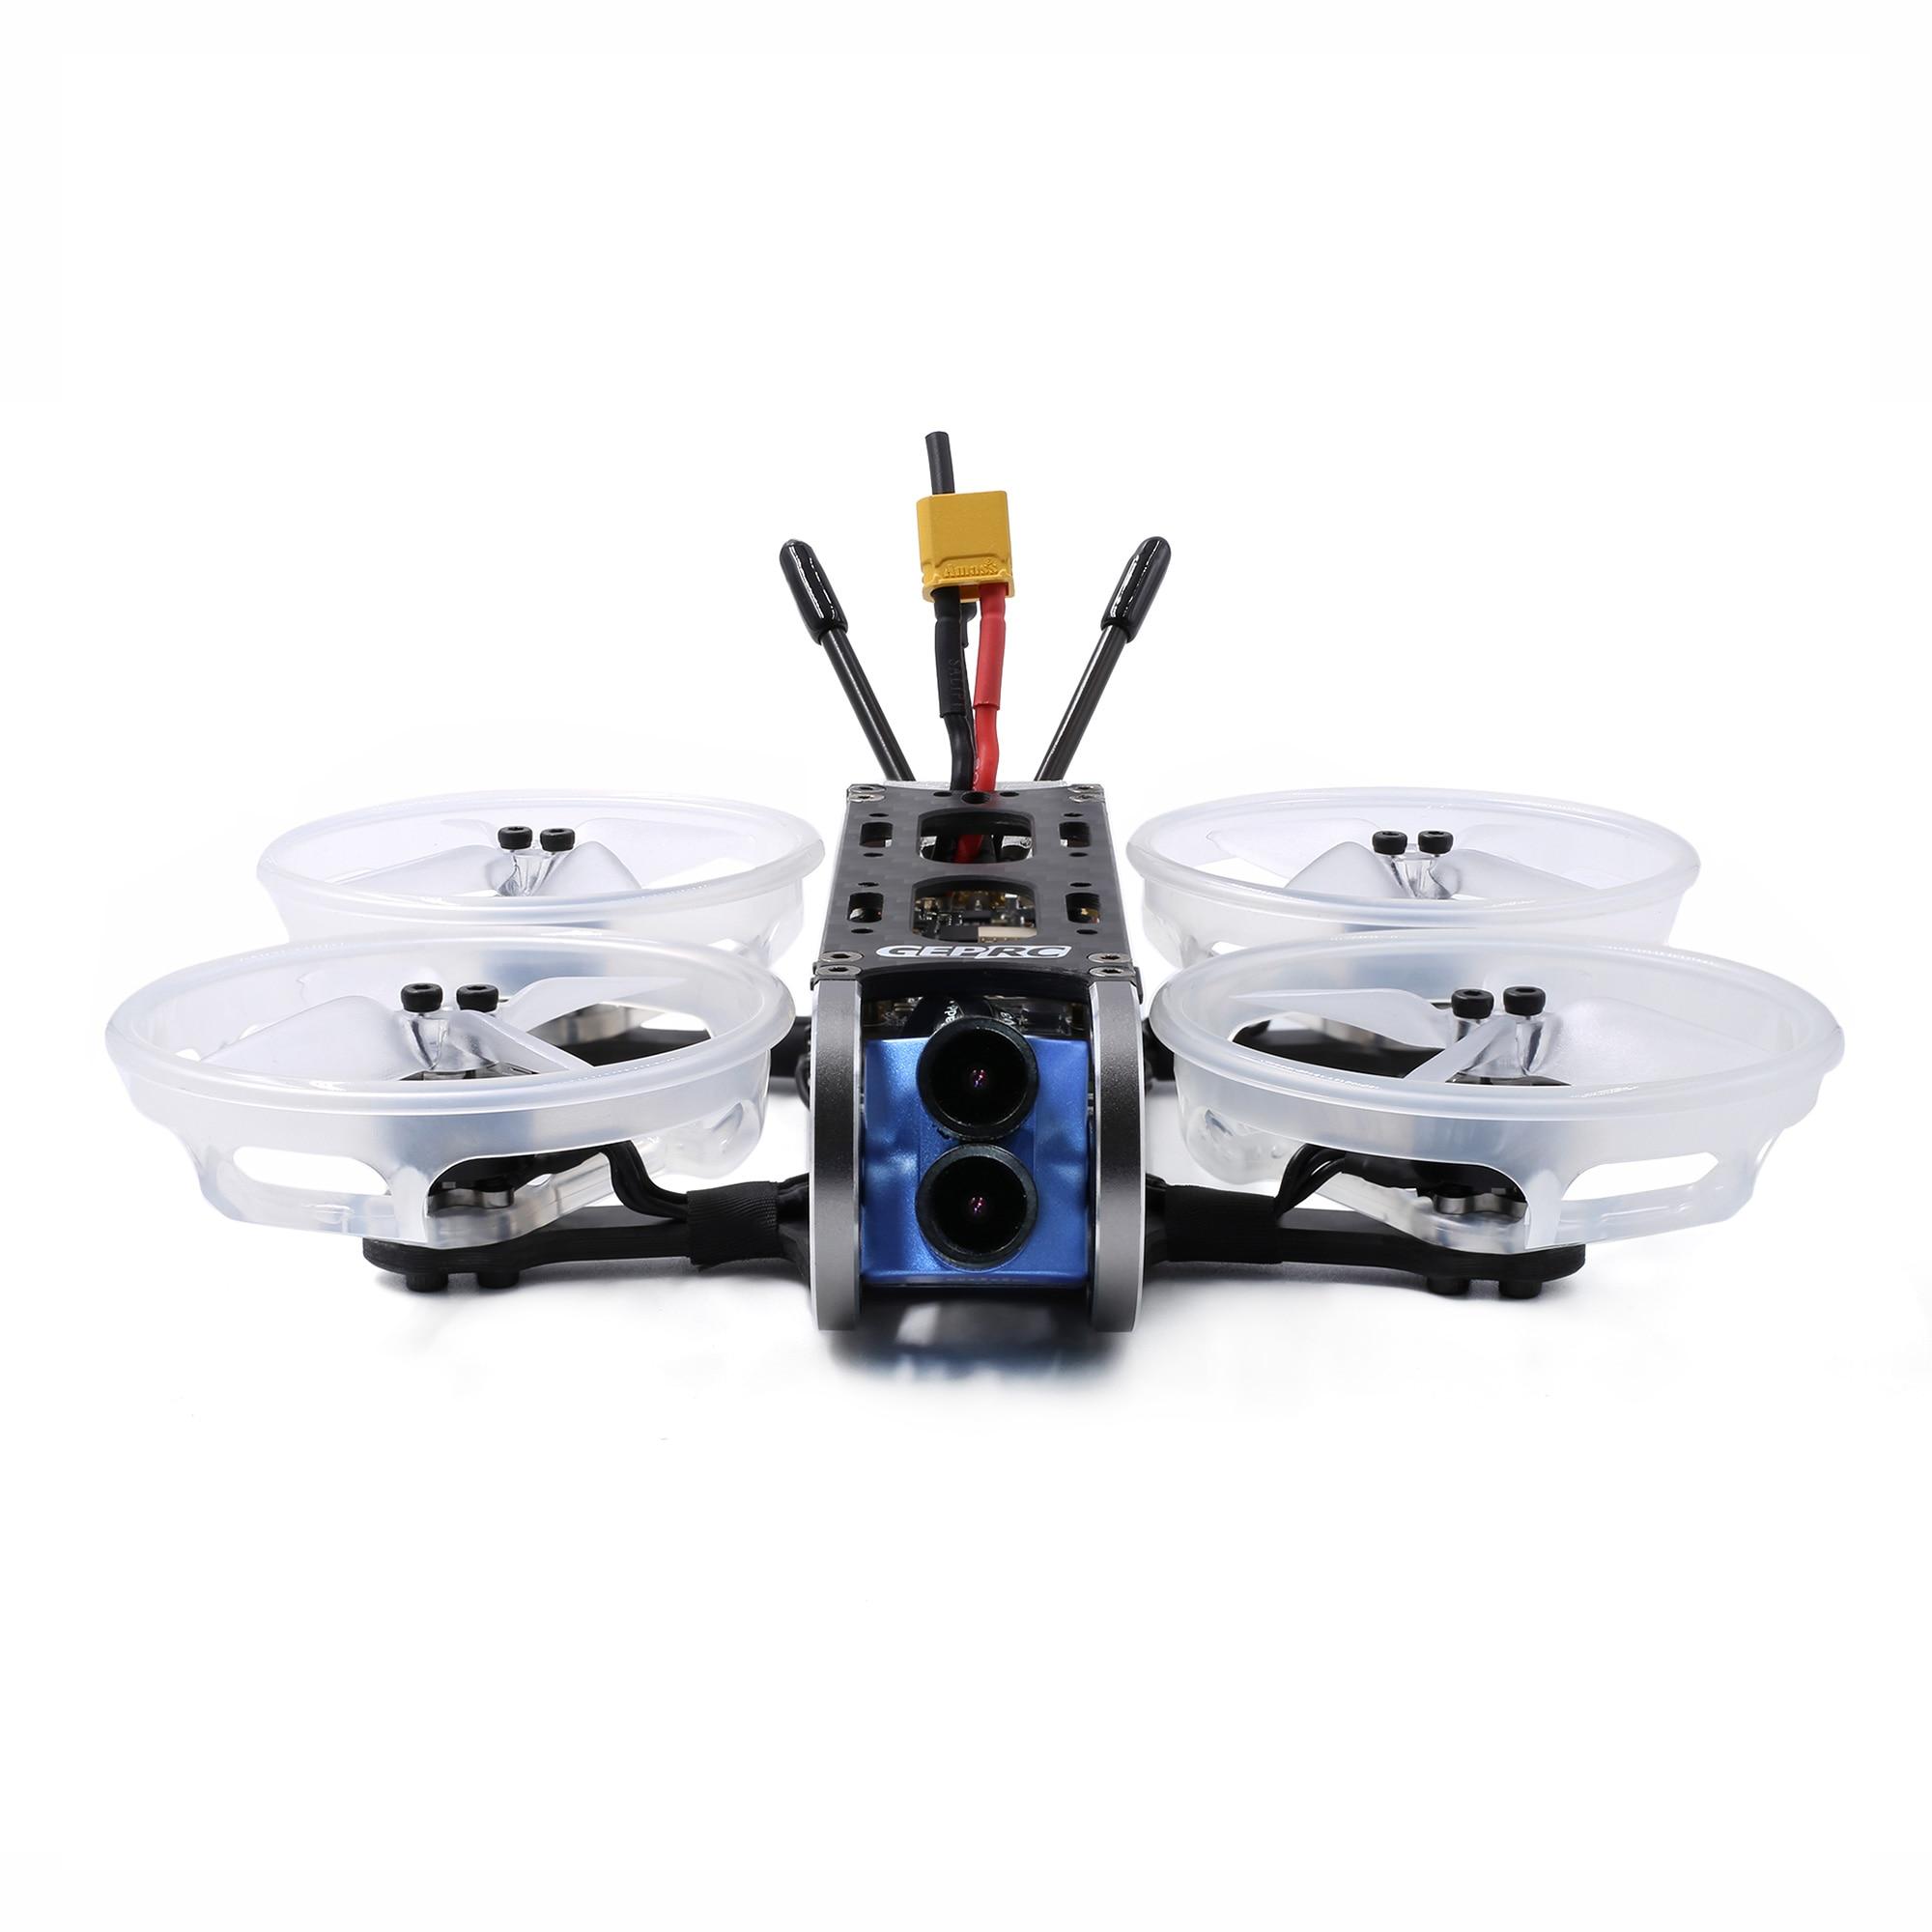 GEPRC CinePro 1080P 4K HD FPV Racing Drone 4S Compatiable mit F7/F4 Flight Controller DALPROP q2035C Requisiten 1105 5000kv motor - 2